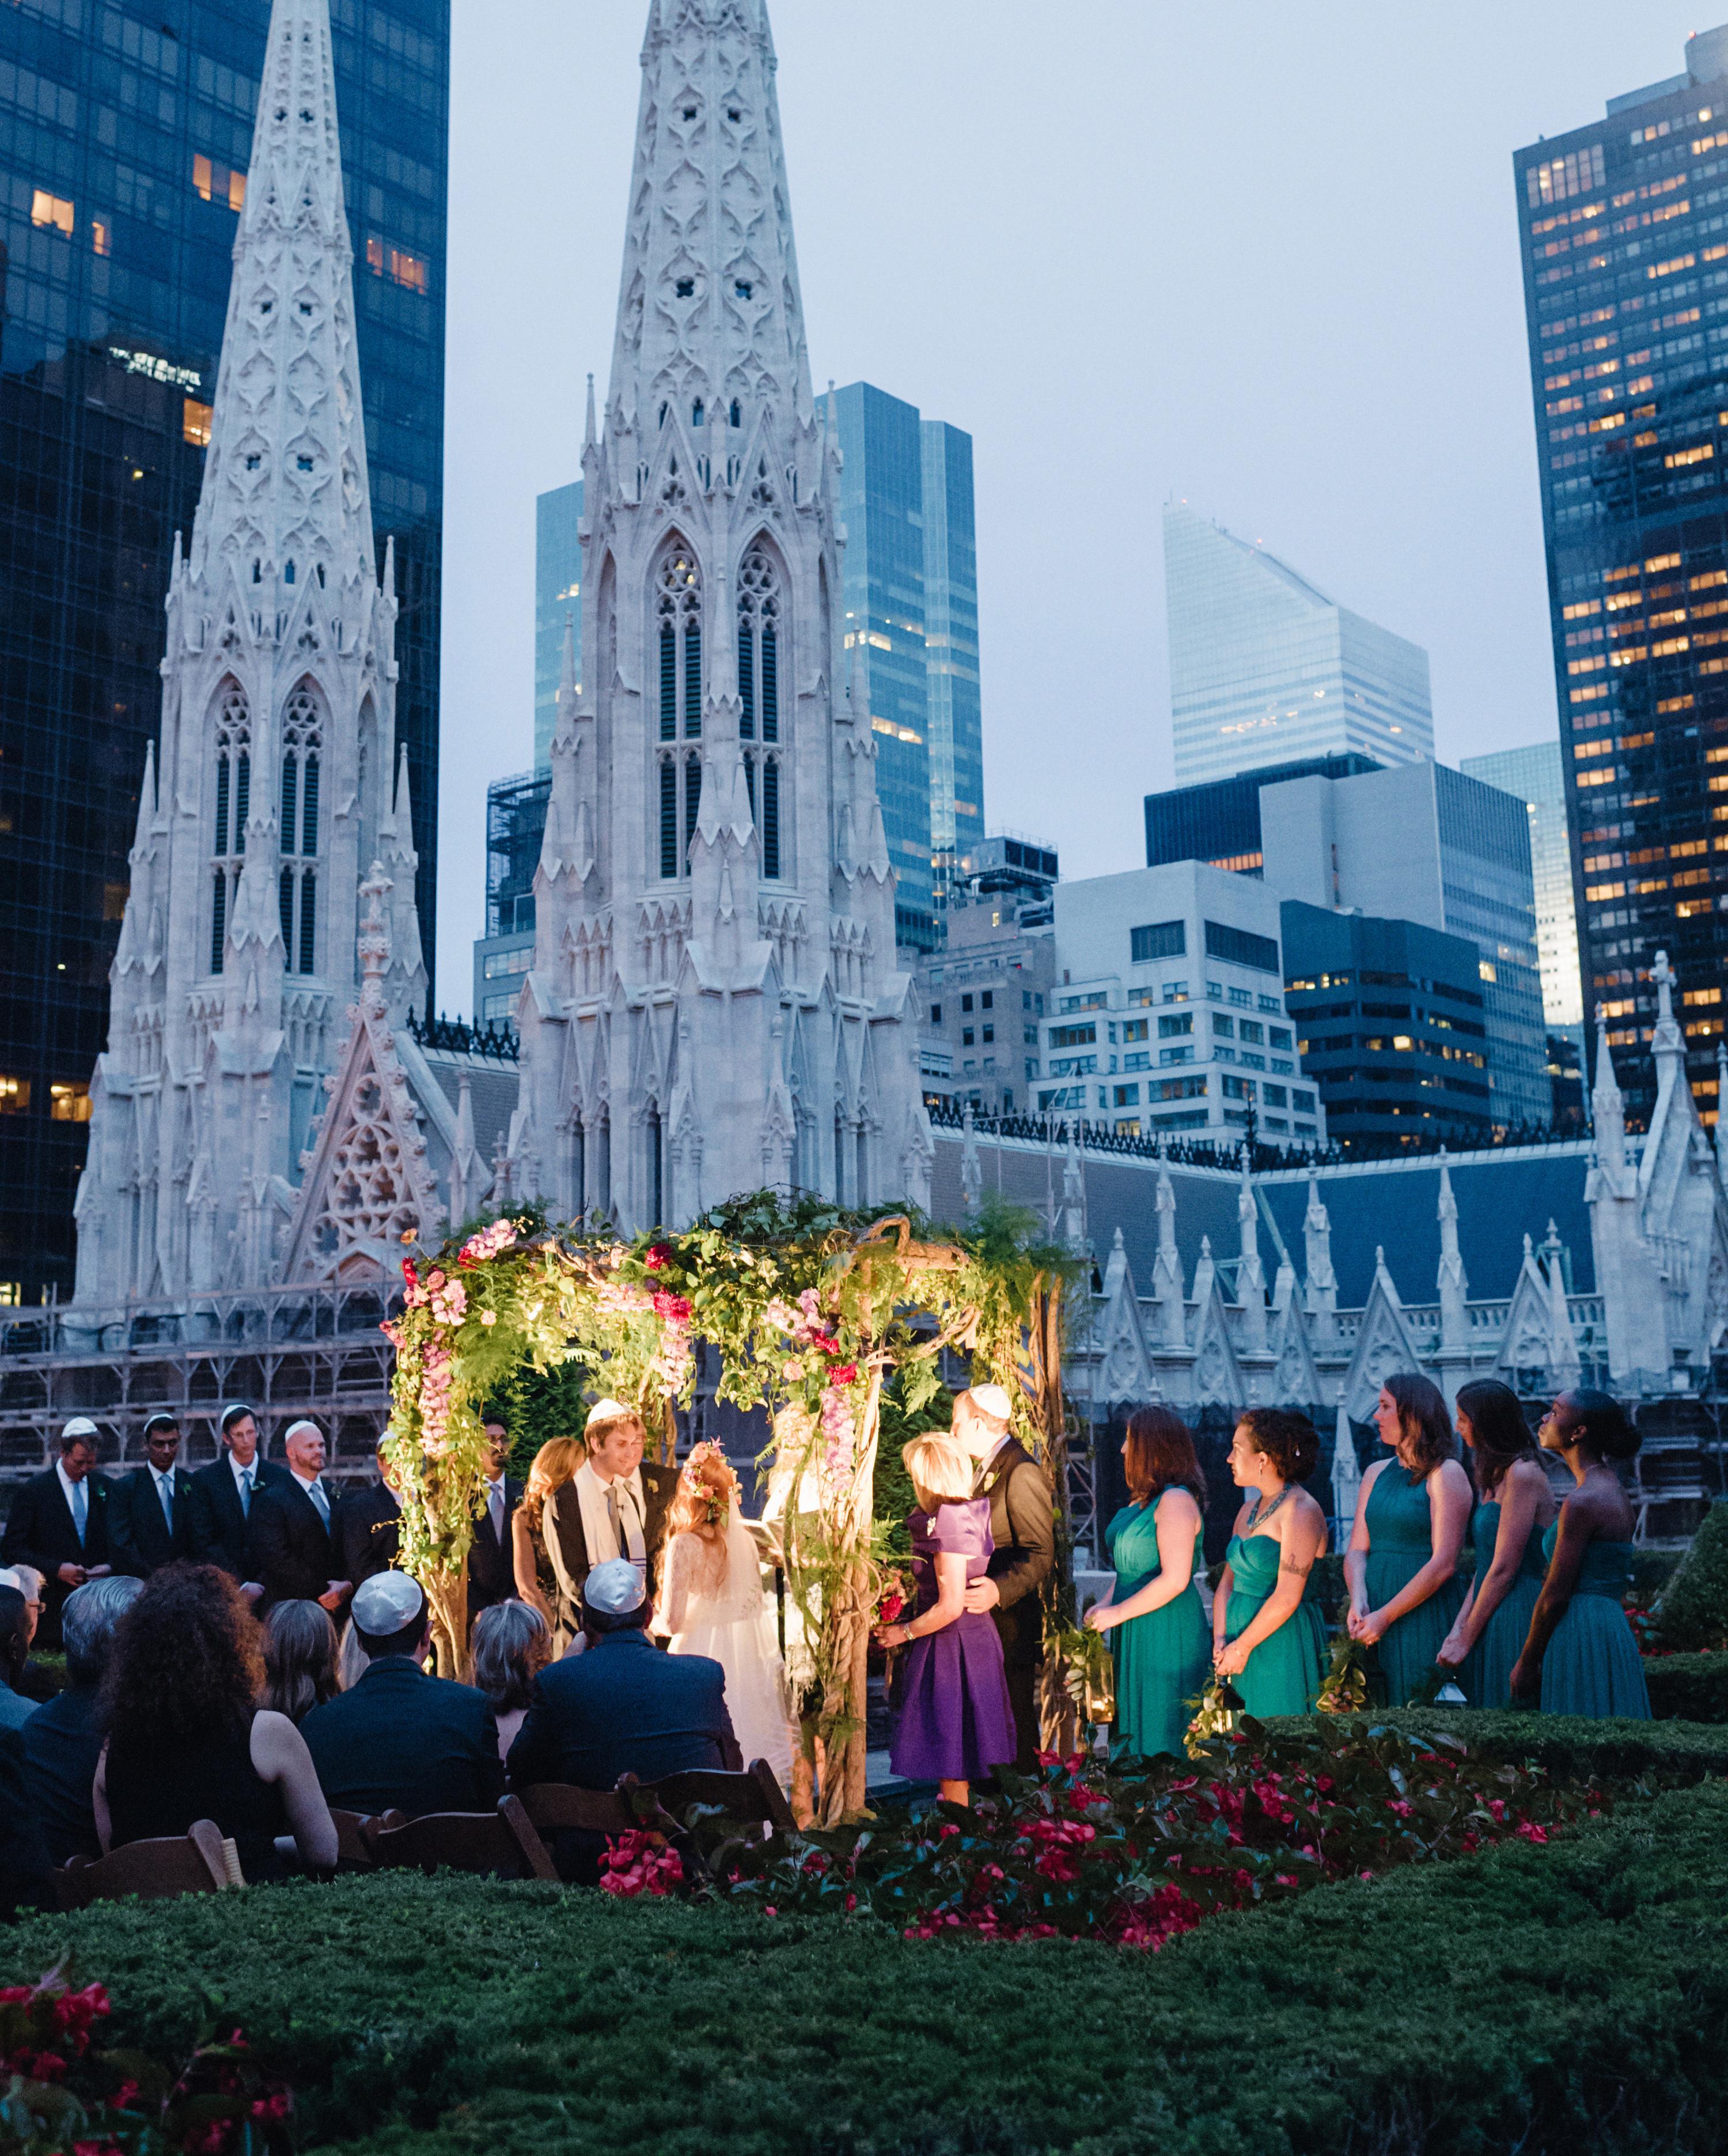 lilly-sean-wedding-ceremony-00461-s112089-0815.jpg